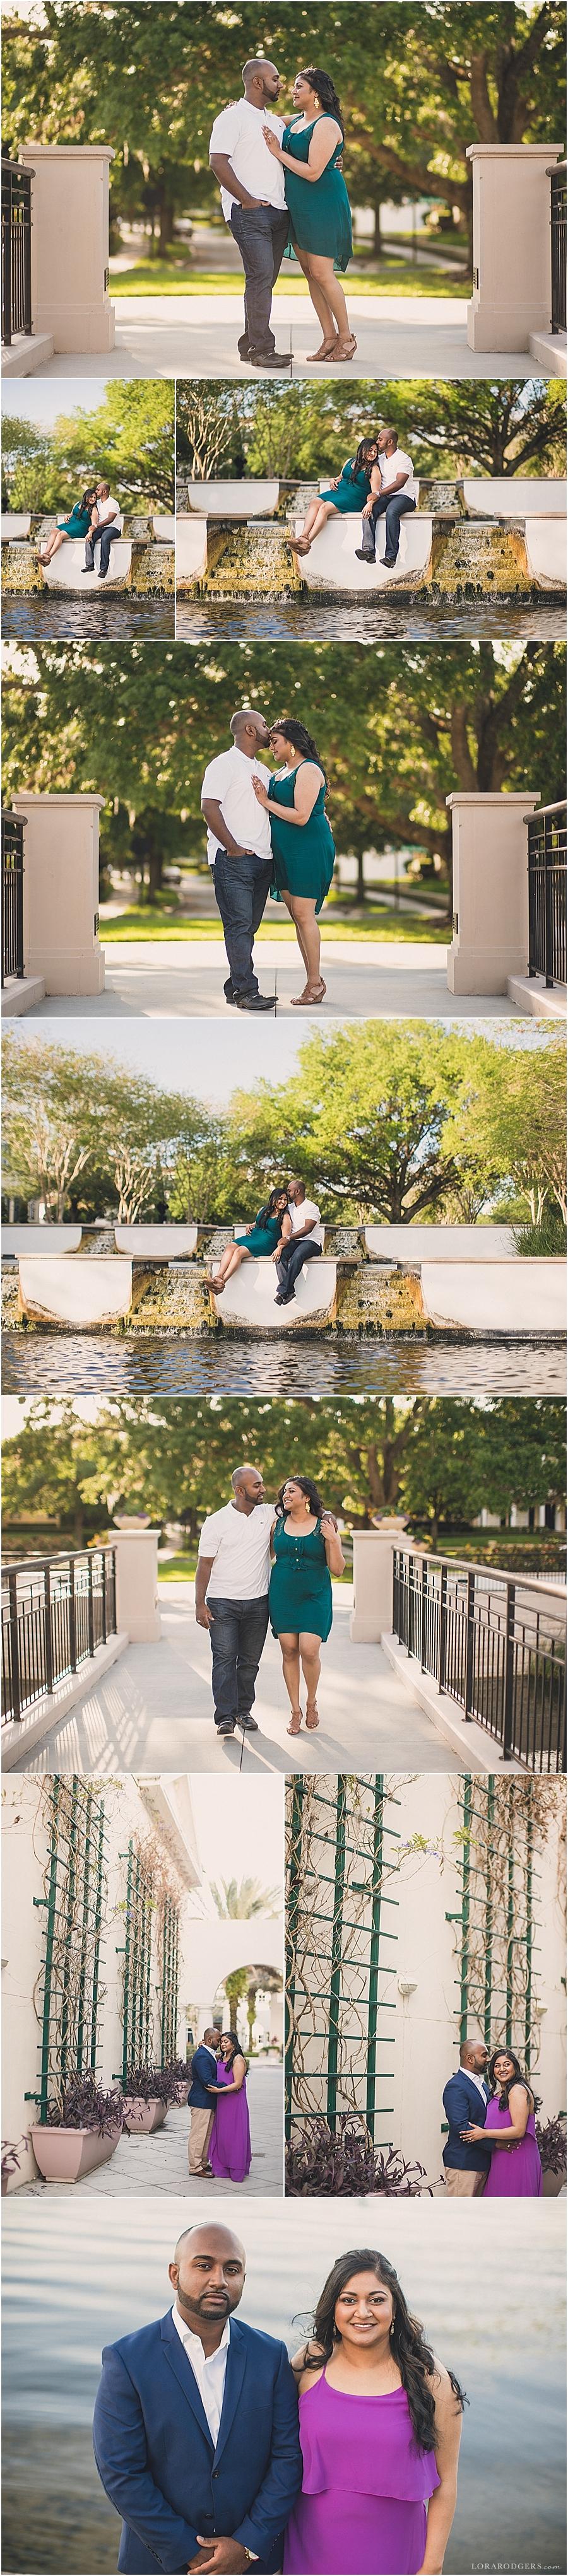 Baldwin_Park_Orlando_Florida_Engagement_004